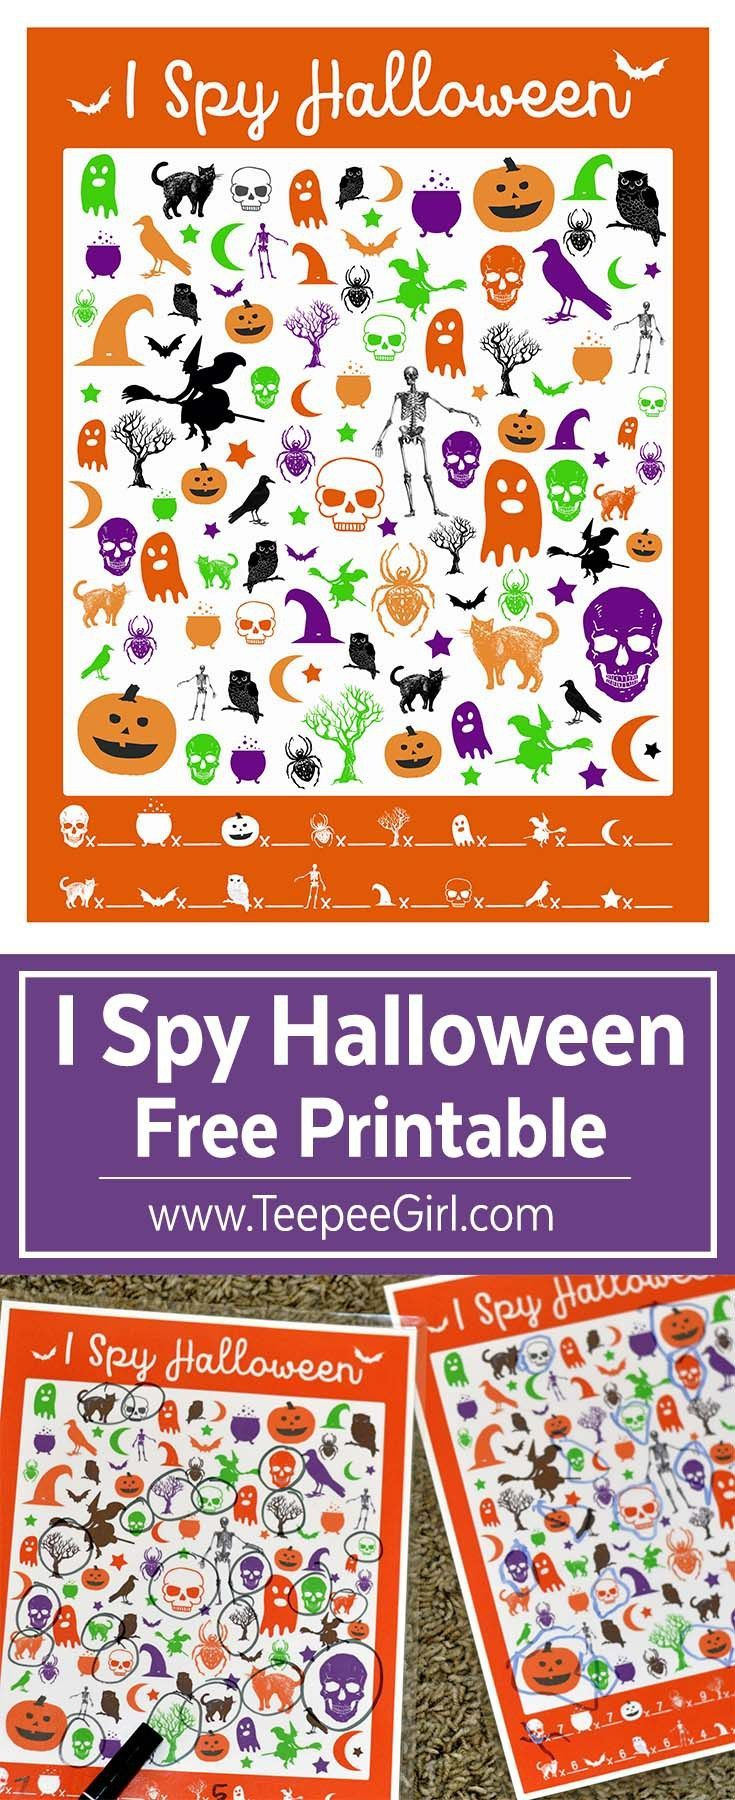 Free I Spy Halloween Printable Game | School Halloween Party